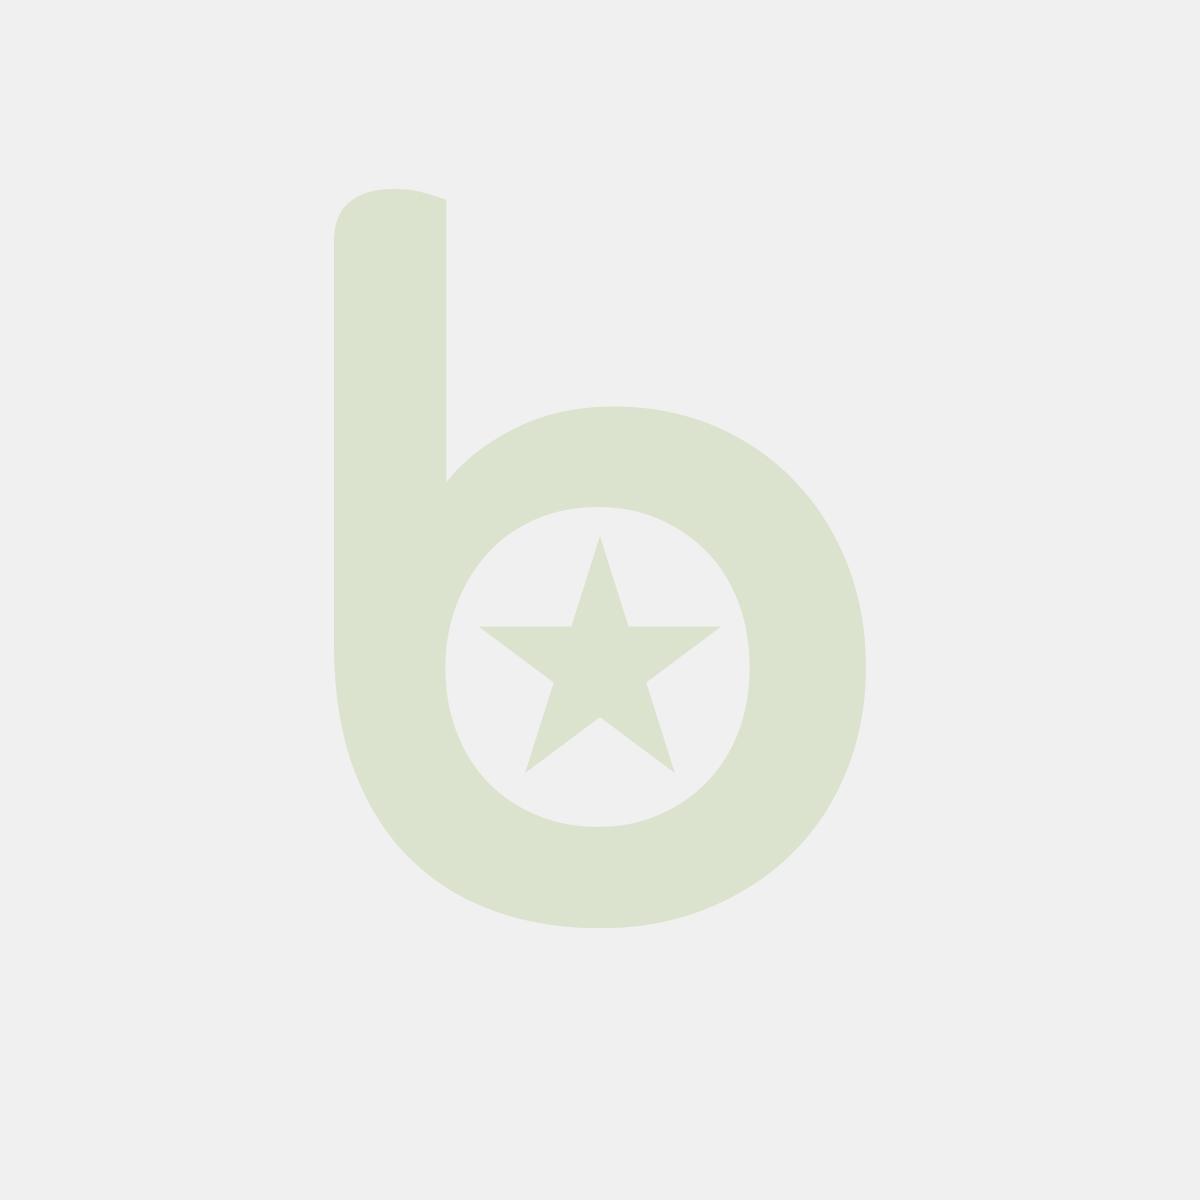 FINGERFOOD - BIO talerzyk SHELLY MINI M PLA, transparenty, 13x8,5cm op. 50 sztuk